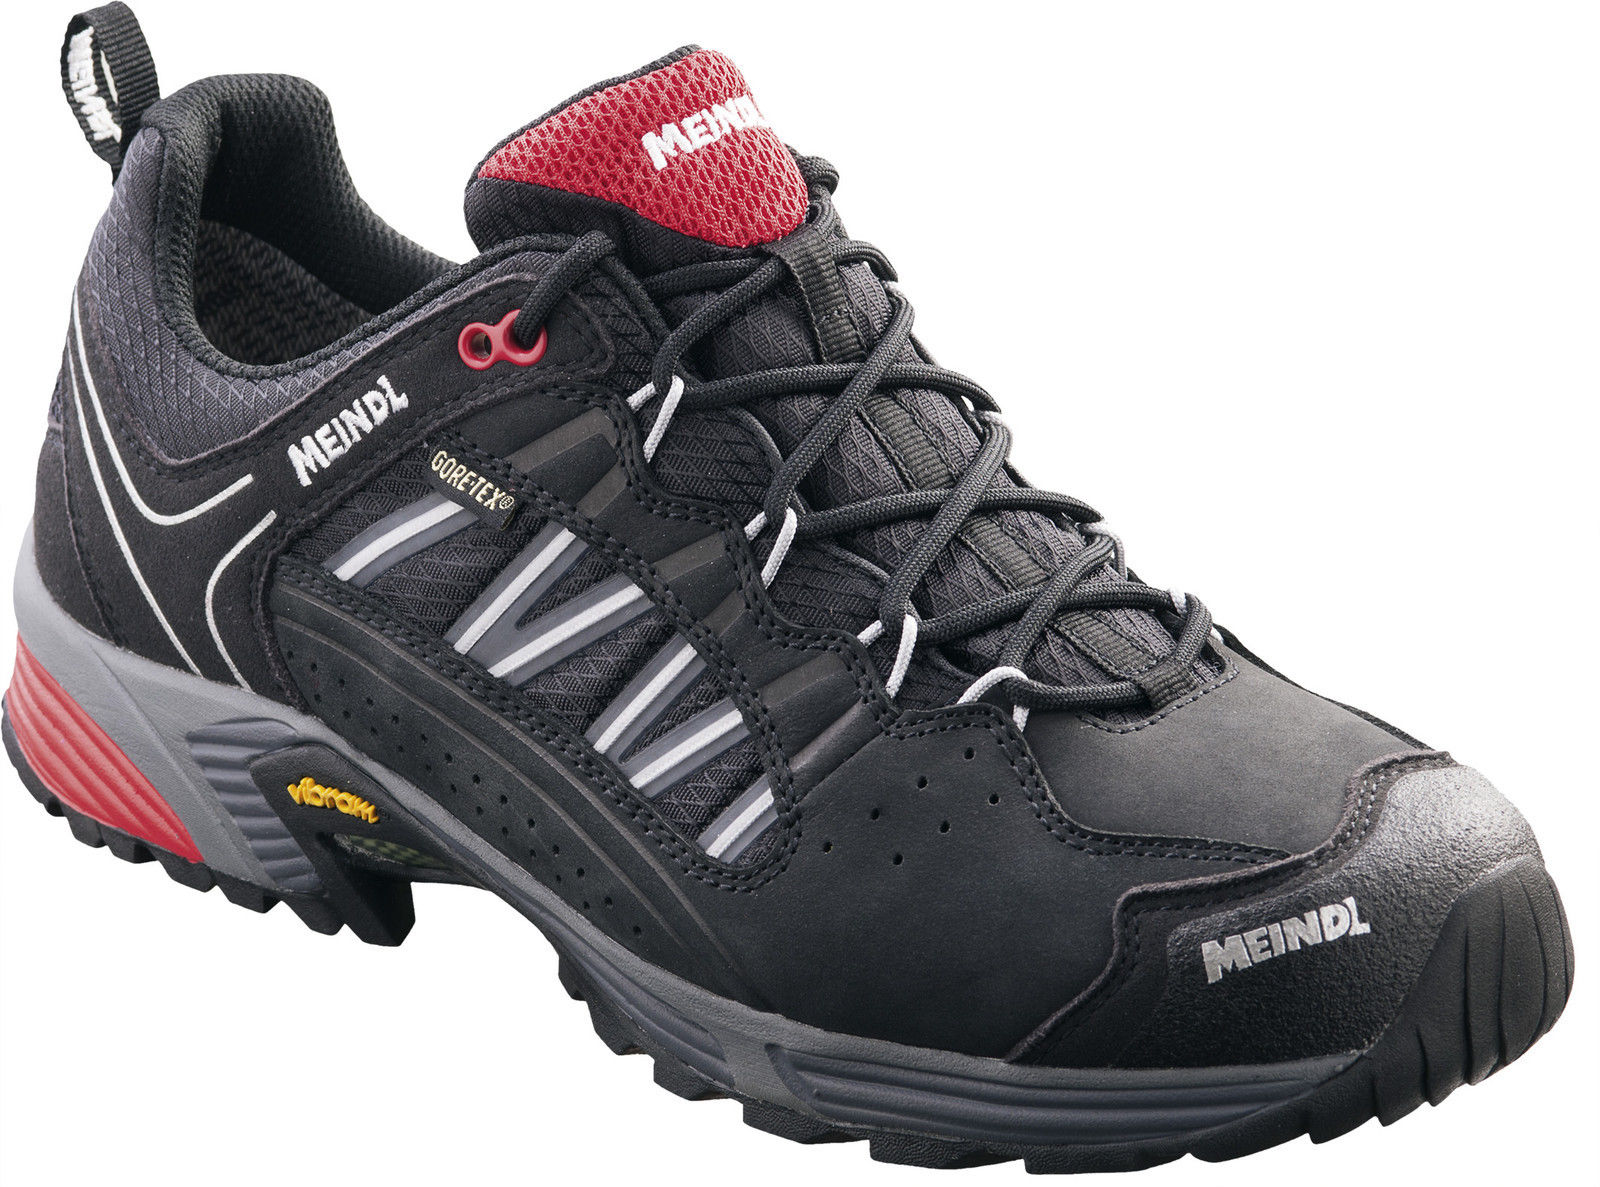 Meindl SX 1.1 GTX Speedhiking Trekkingschuhe schwarz/rot Herren(3060-01) NEUWARE